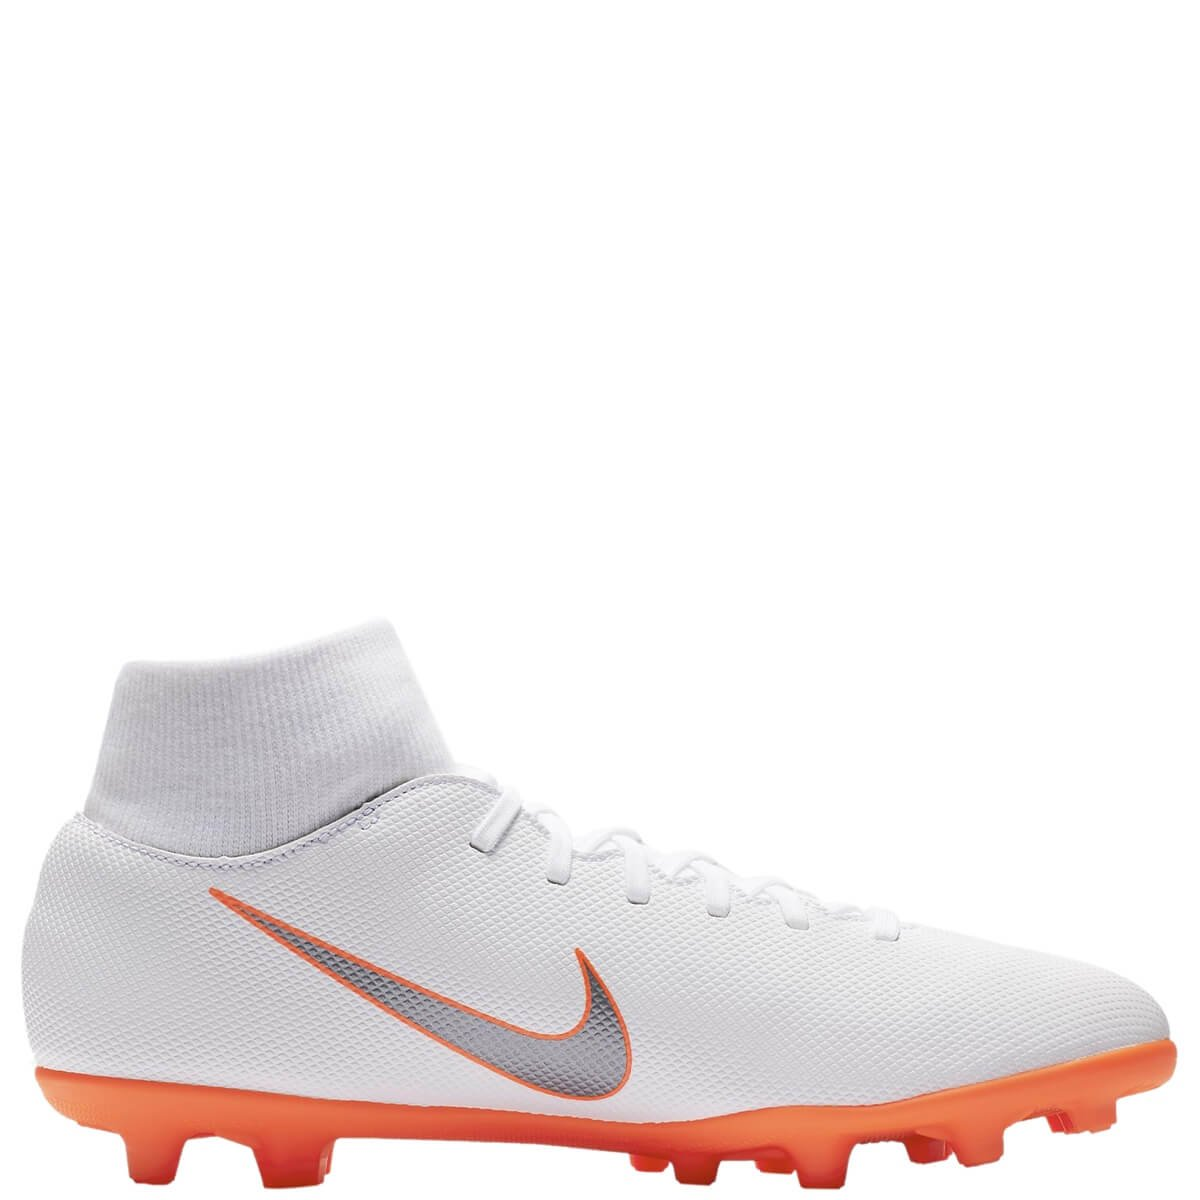 260d7b2652 Bizz Store - Chuteira Futebol de Campo Nike Superfly 6 Club